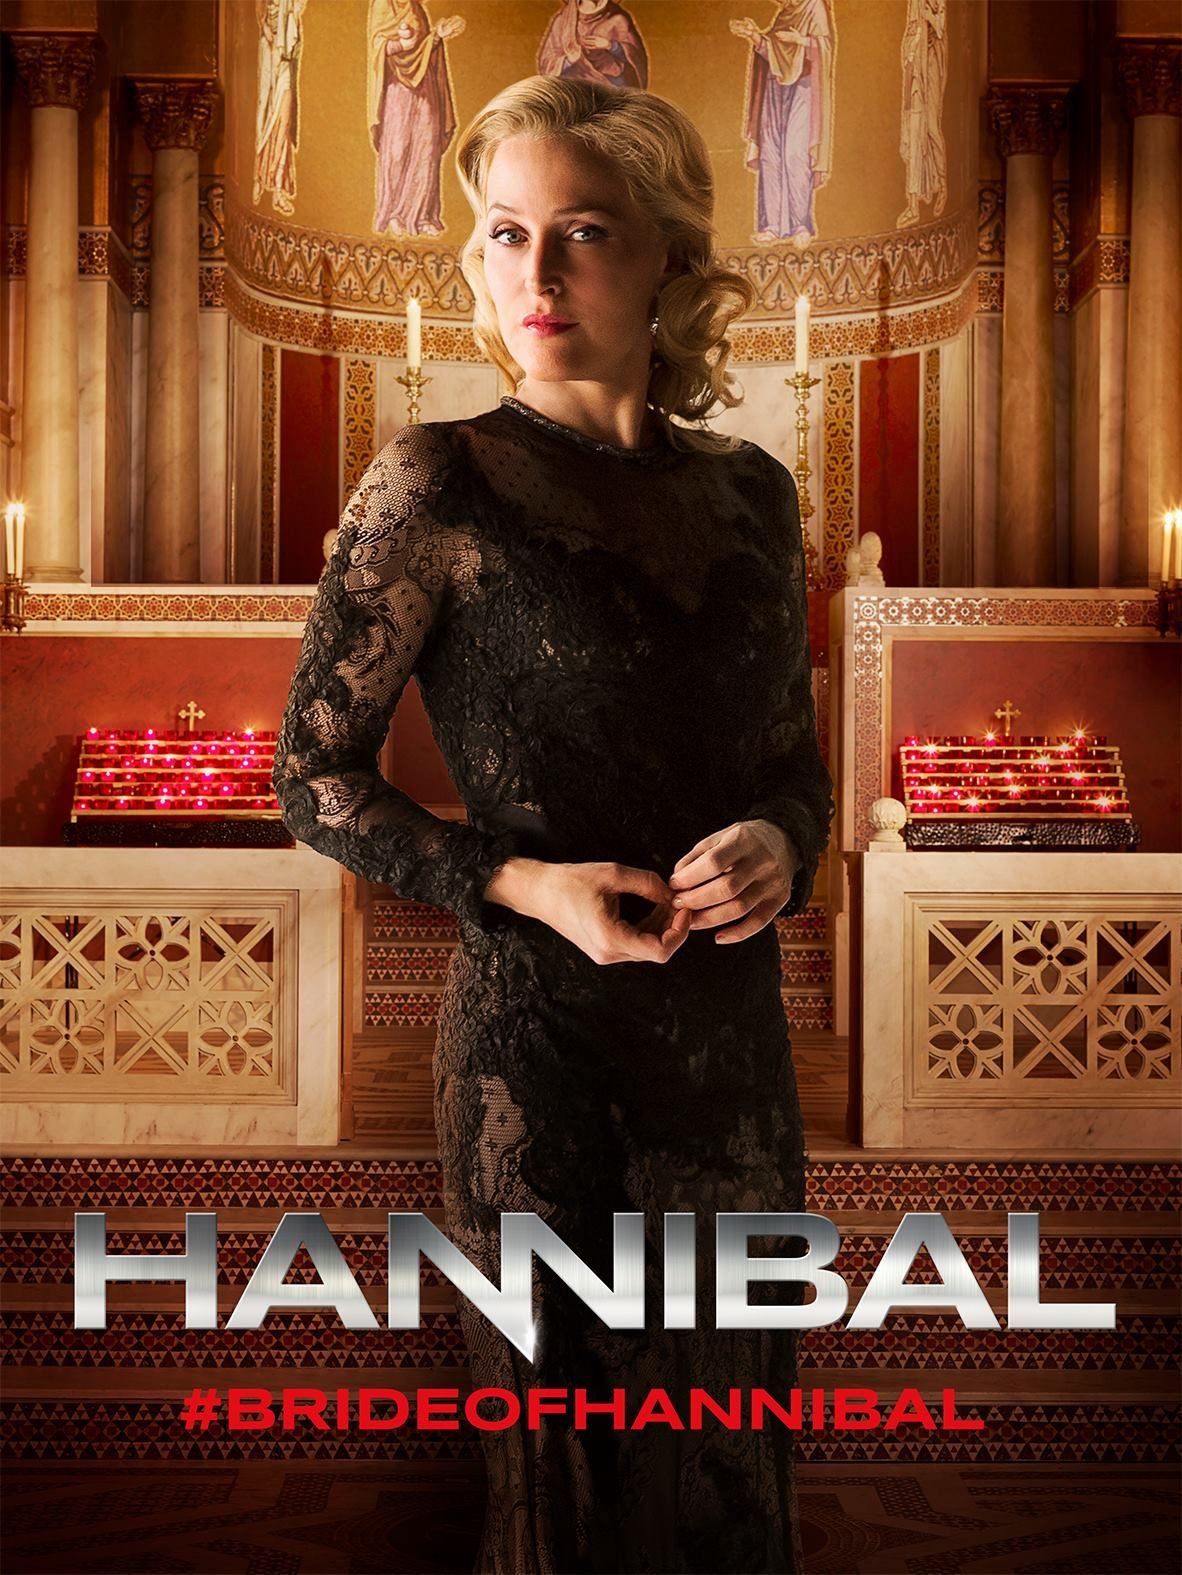 hannibal serie trailer español